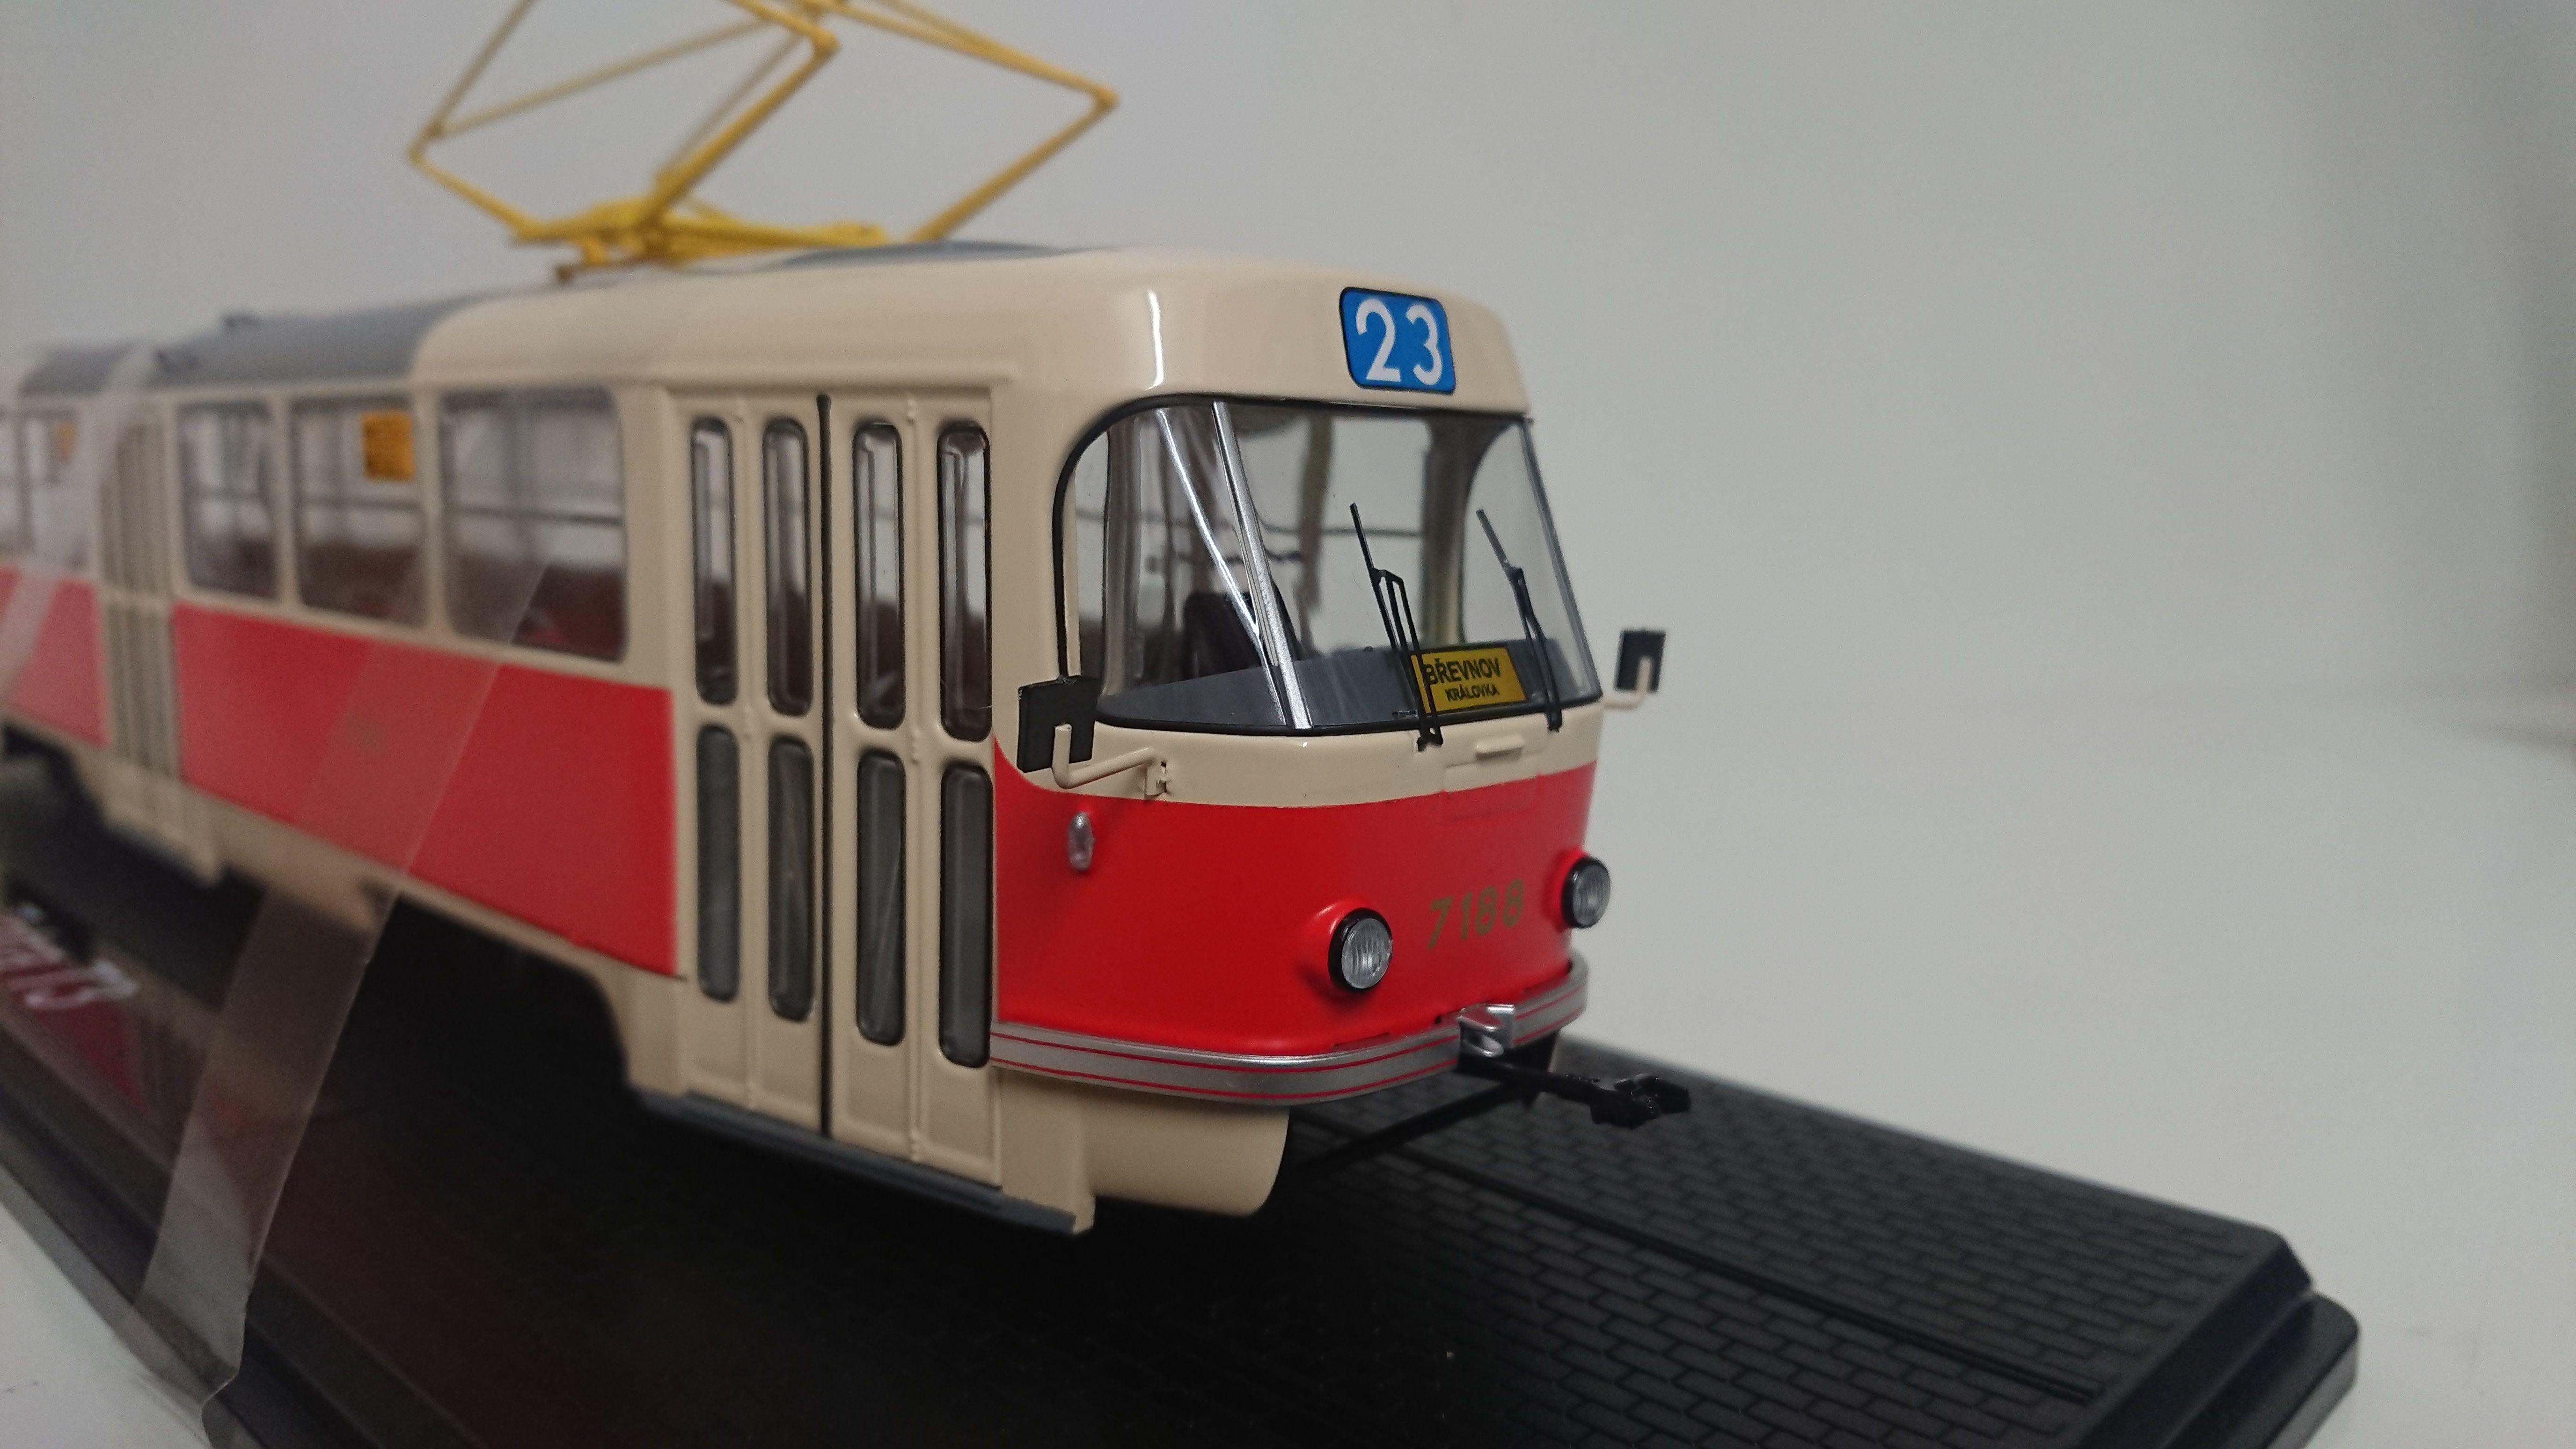 Macheta tramvai Tatra T3, scara 1:43 0